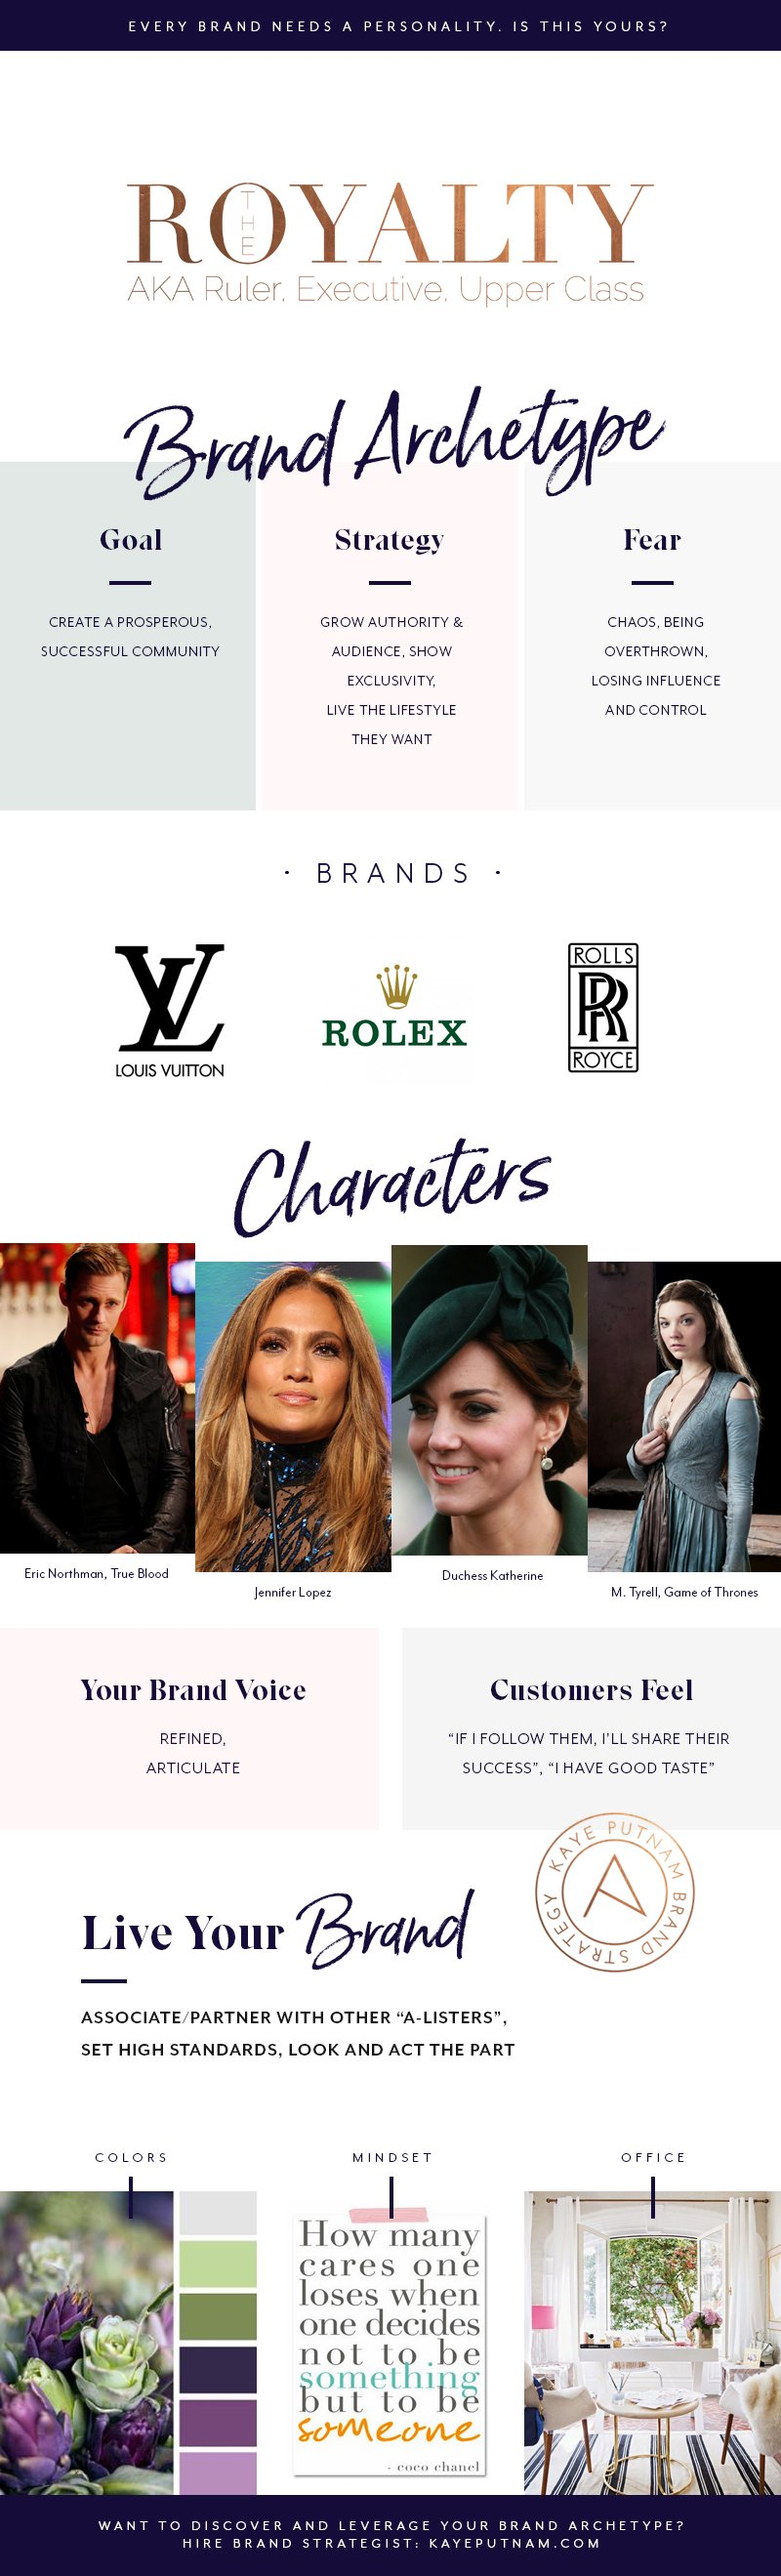 Royalty Brand Archetype Infographic